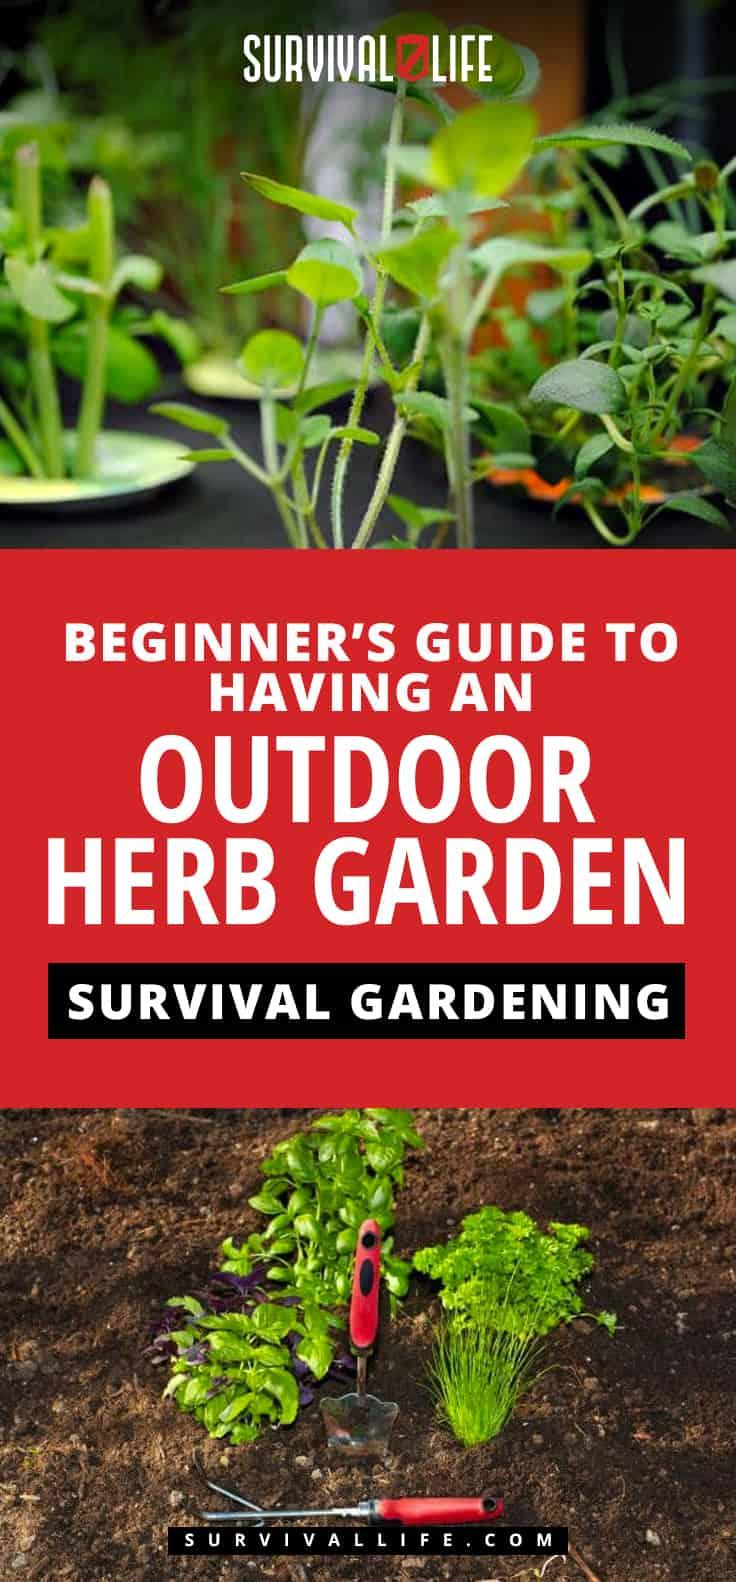 Outdoor Herb Garden | A Beginner's Guide To Survival Gardening | https://survivallife.com/survival-gardening-outdoor-herb-garden/